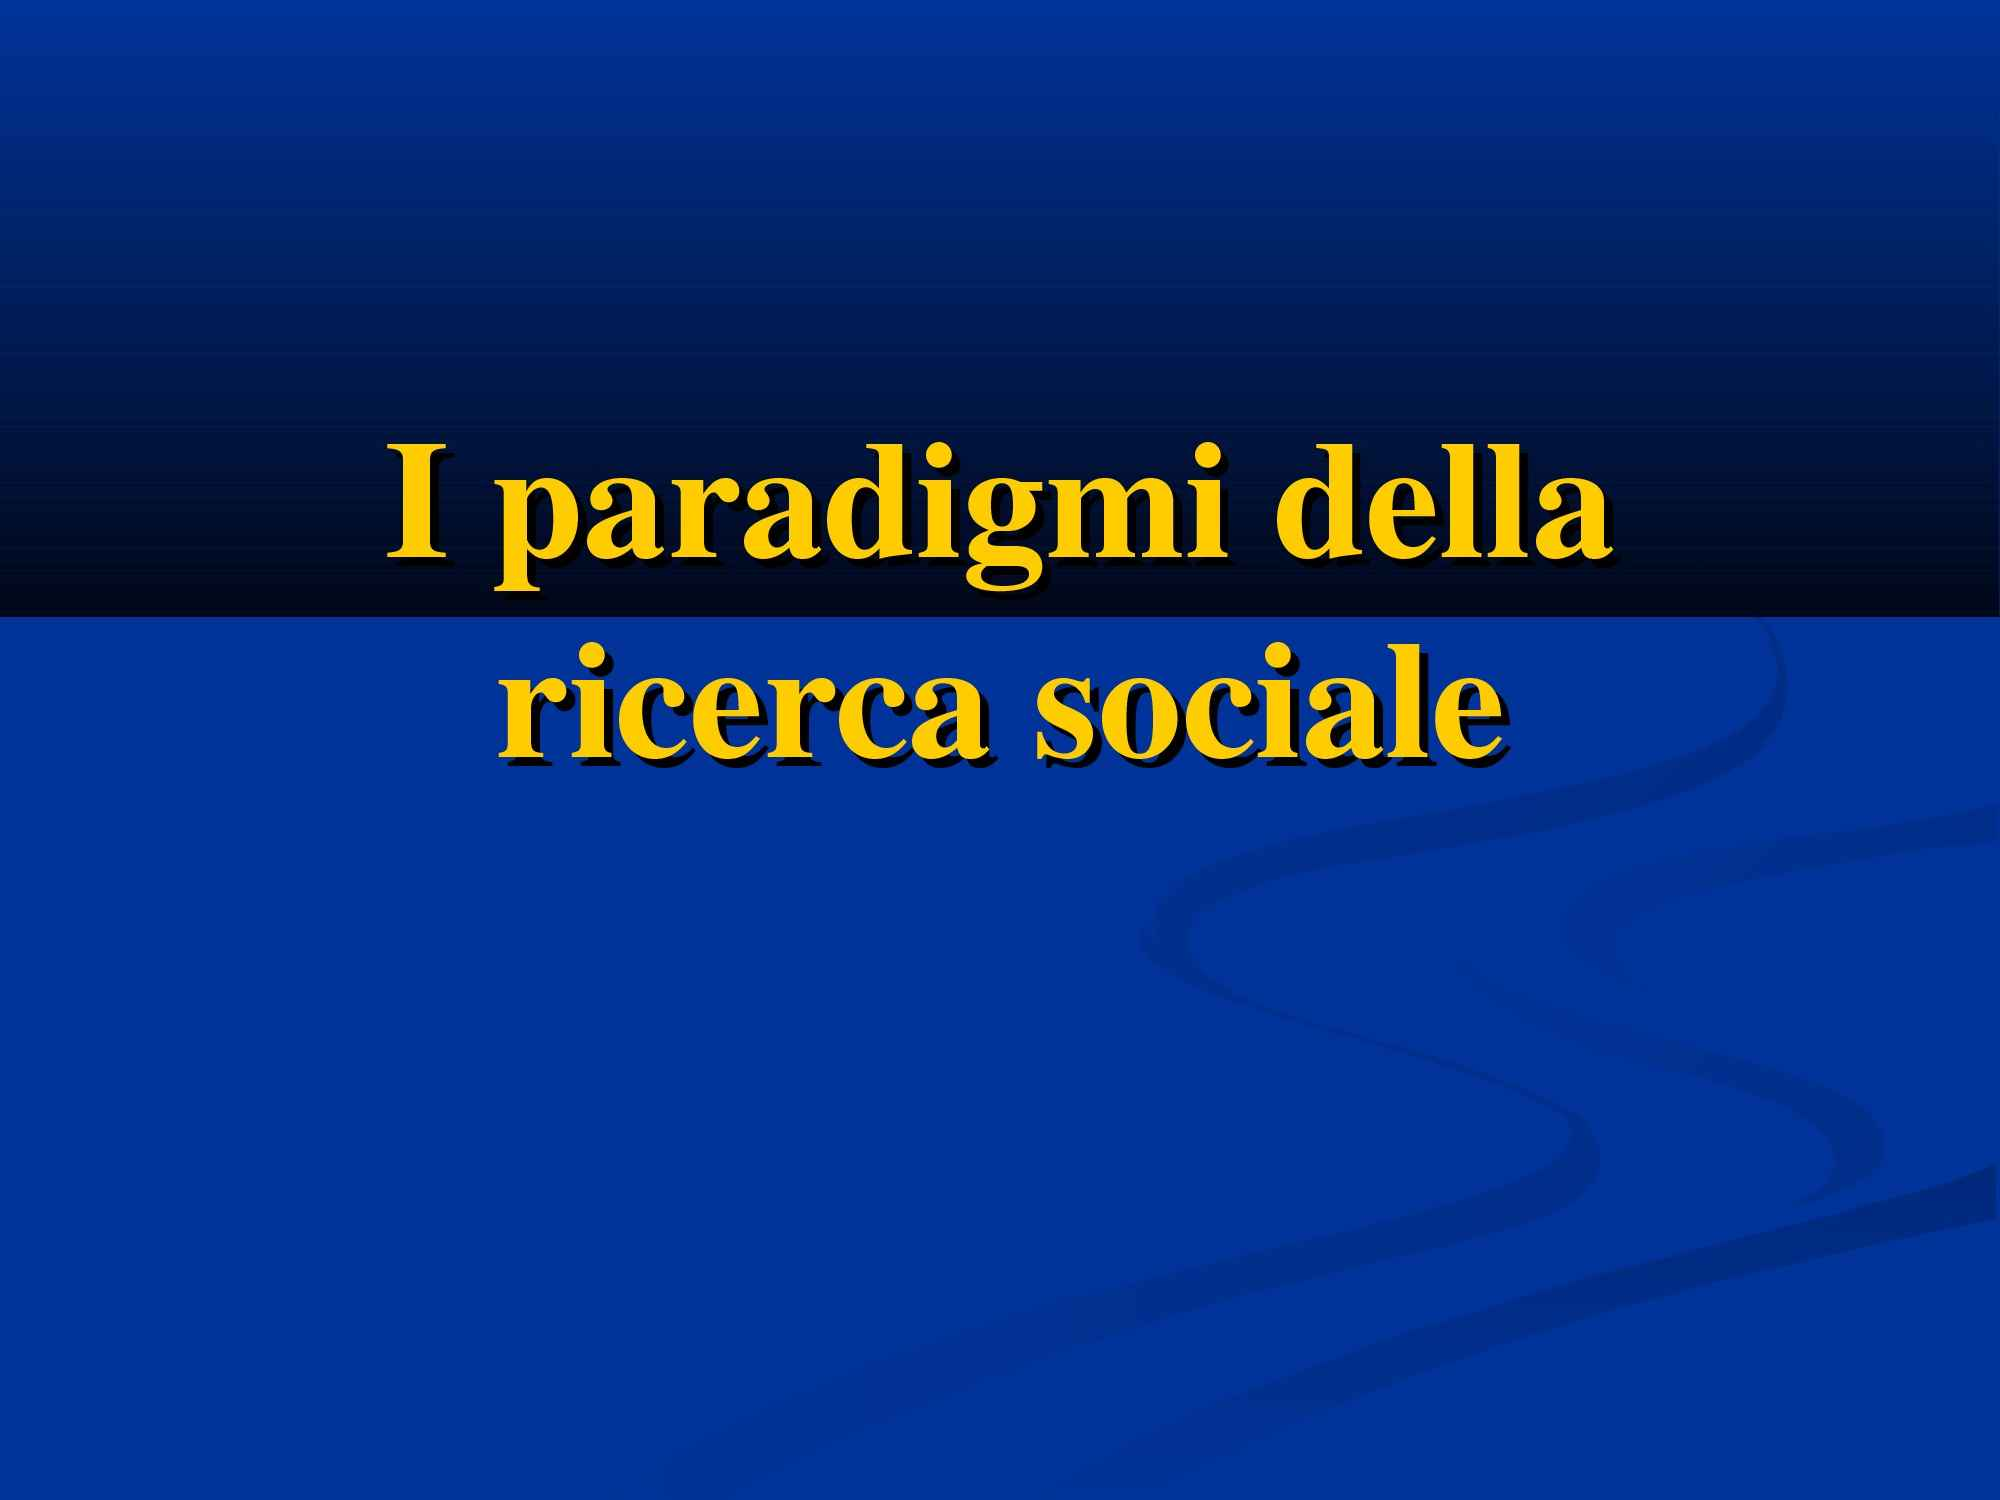 Paradigmi della ricerca sociale